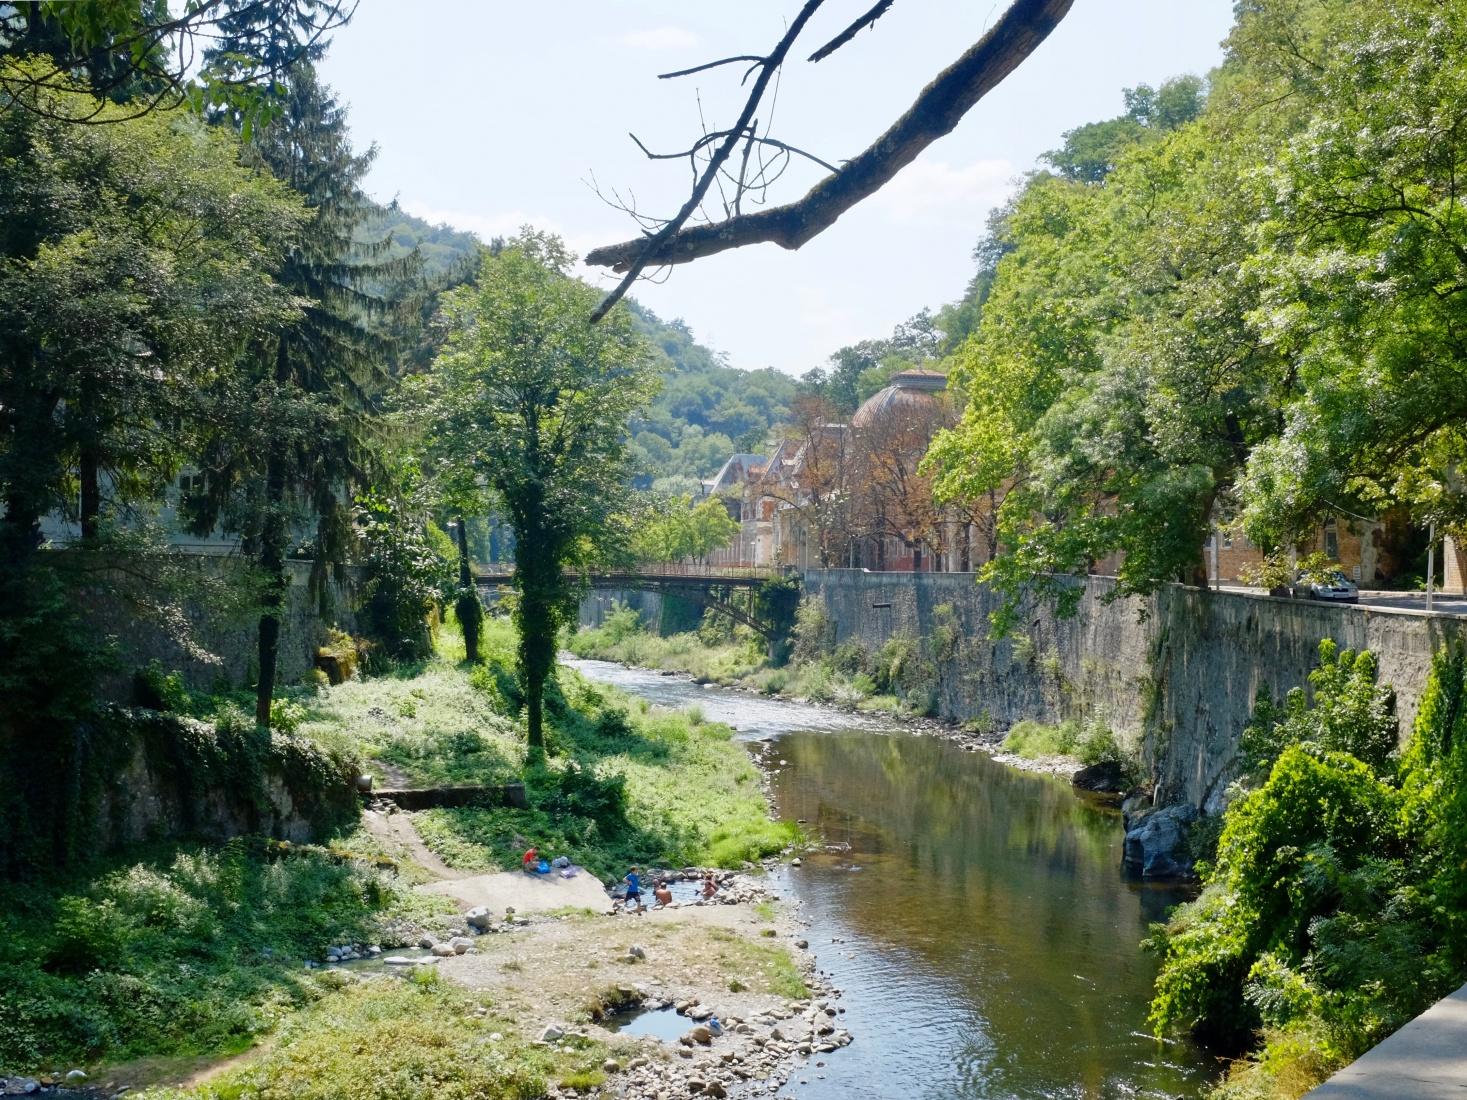 A view of the beautiful Cerna River near the Baths of Hercules in Brașov, Romania.